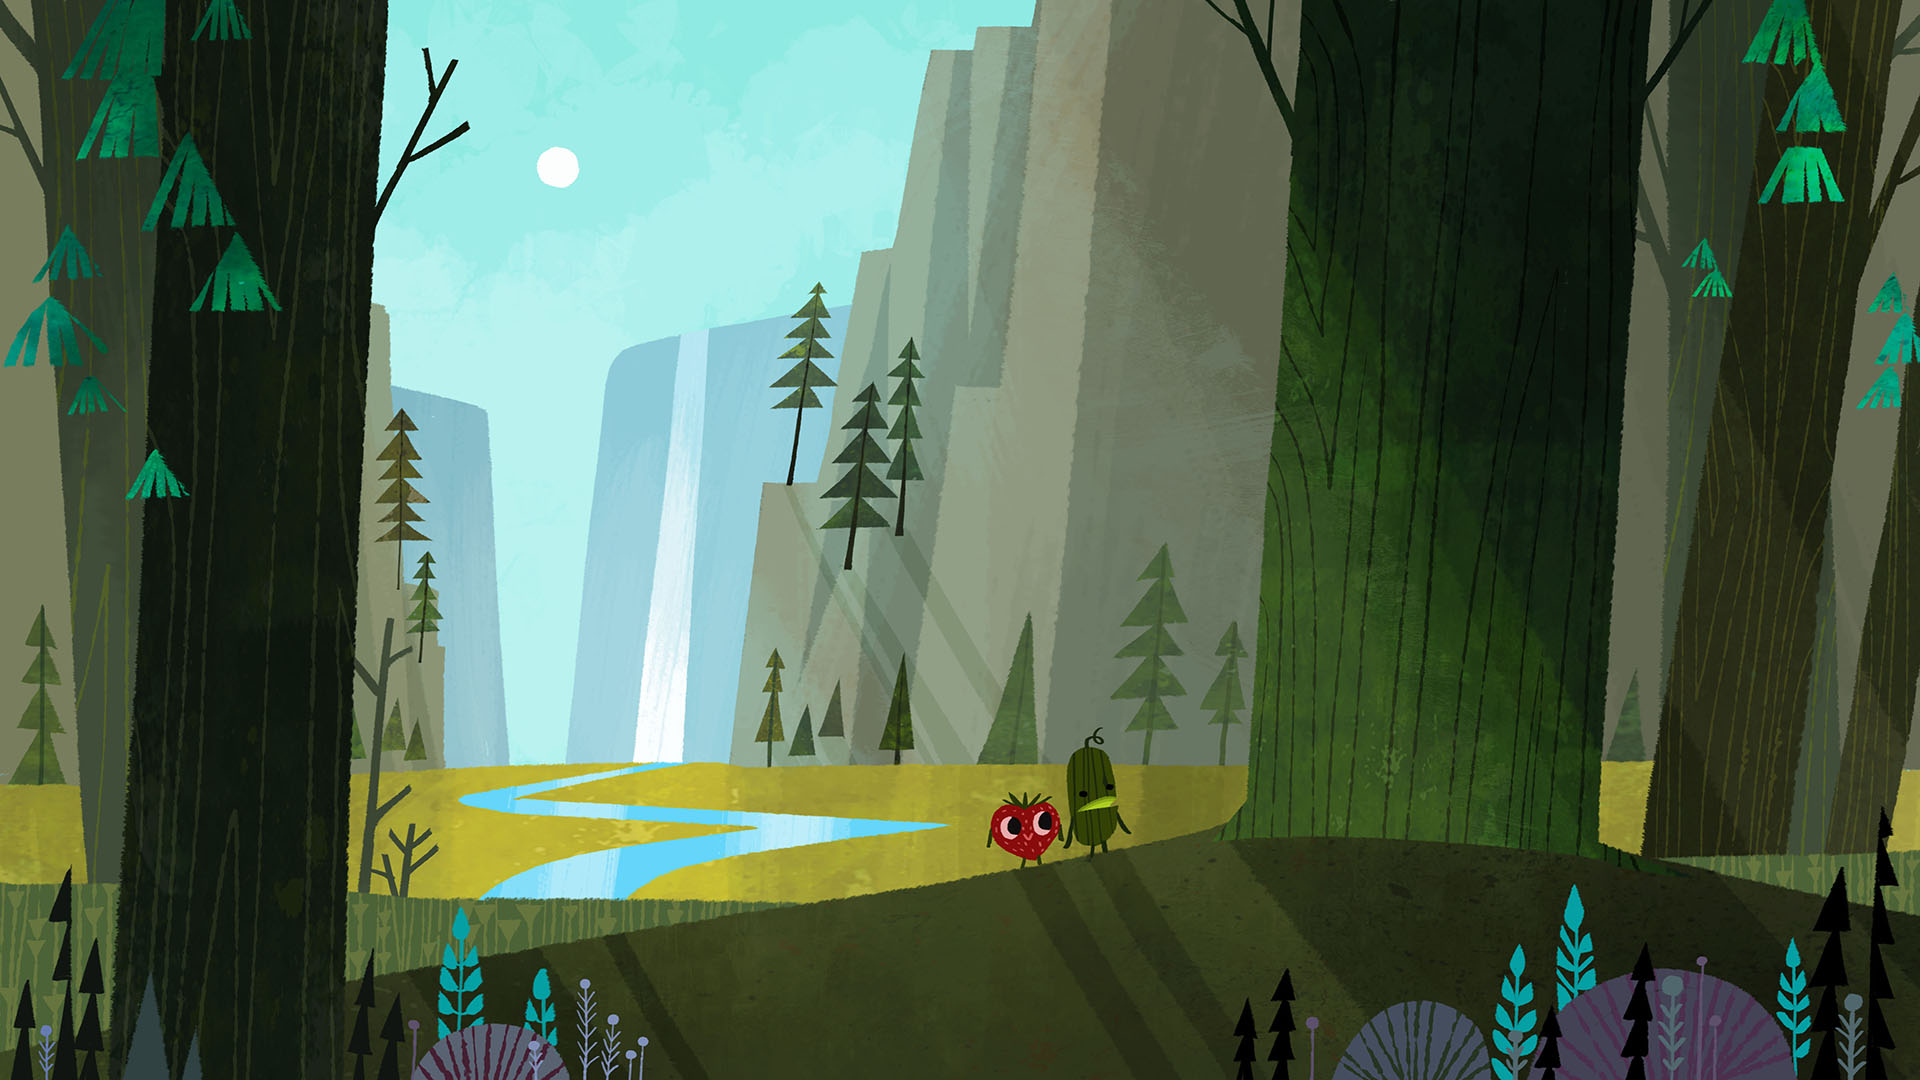 cls_woods_design.jpg